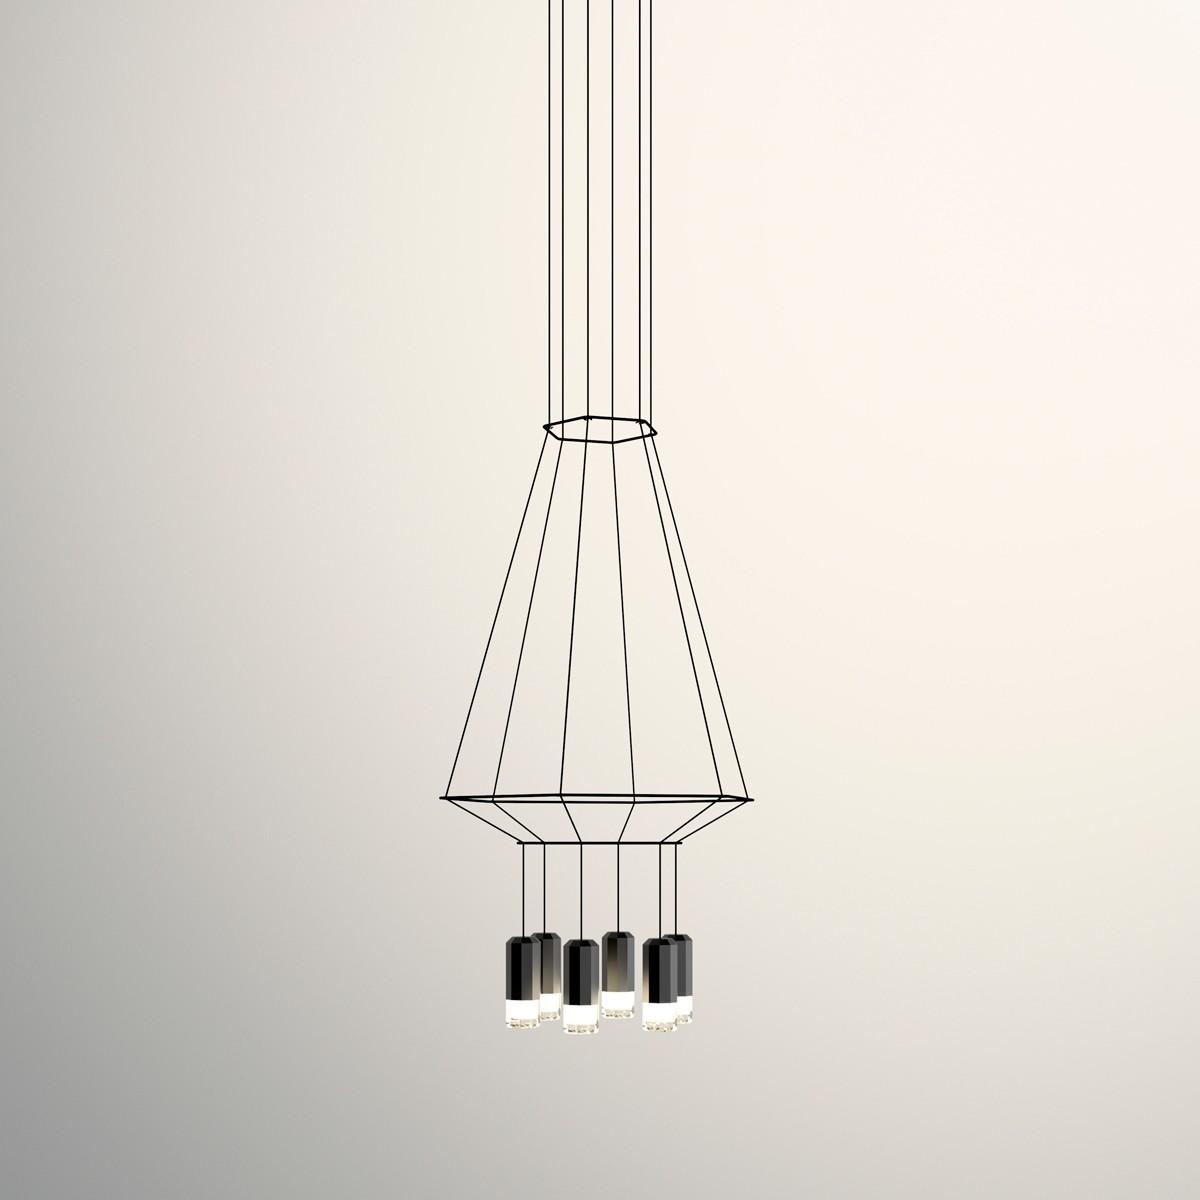 Vibia Wireflow Pendelleuchte, 6-flg., 90 x 104 cm, schwarz